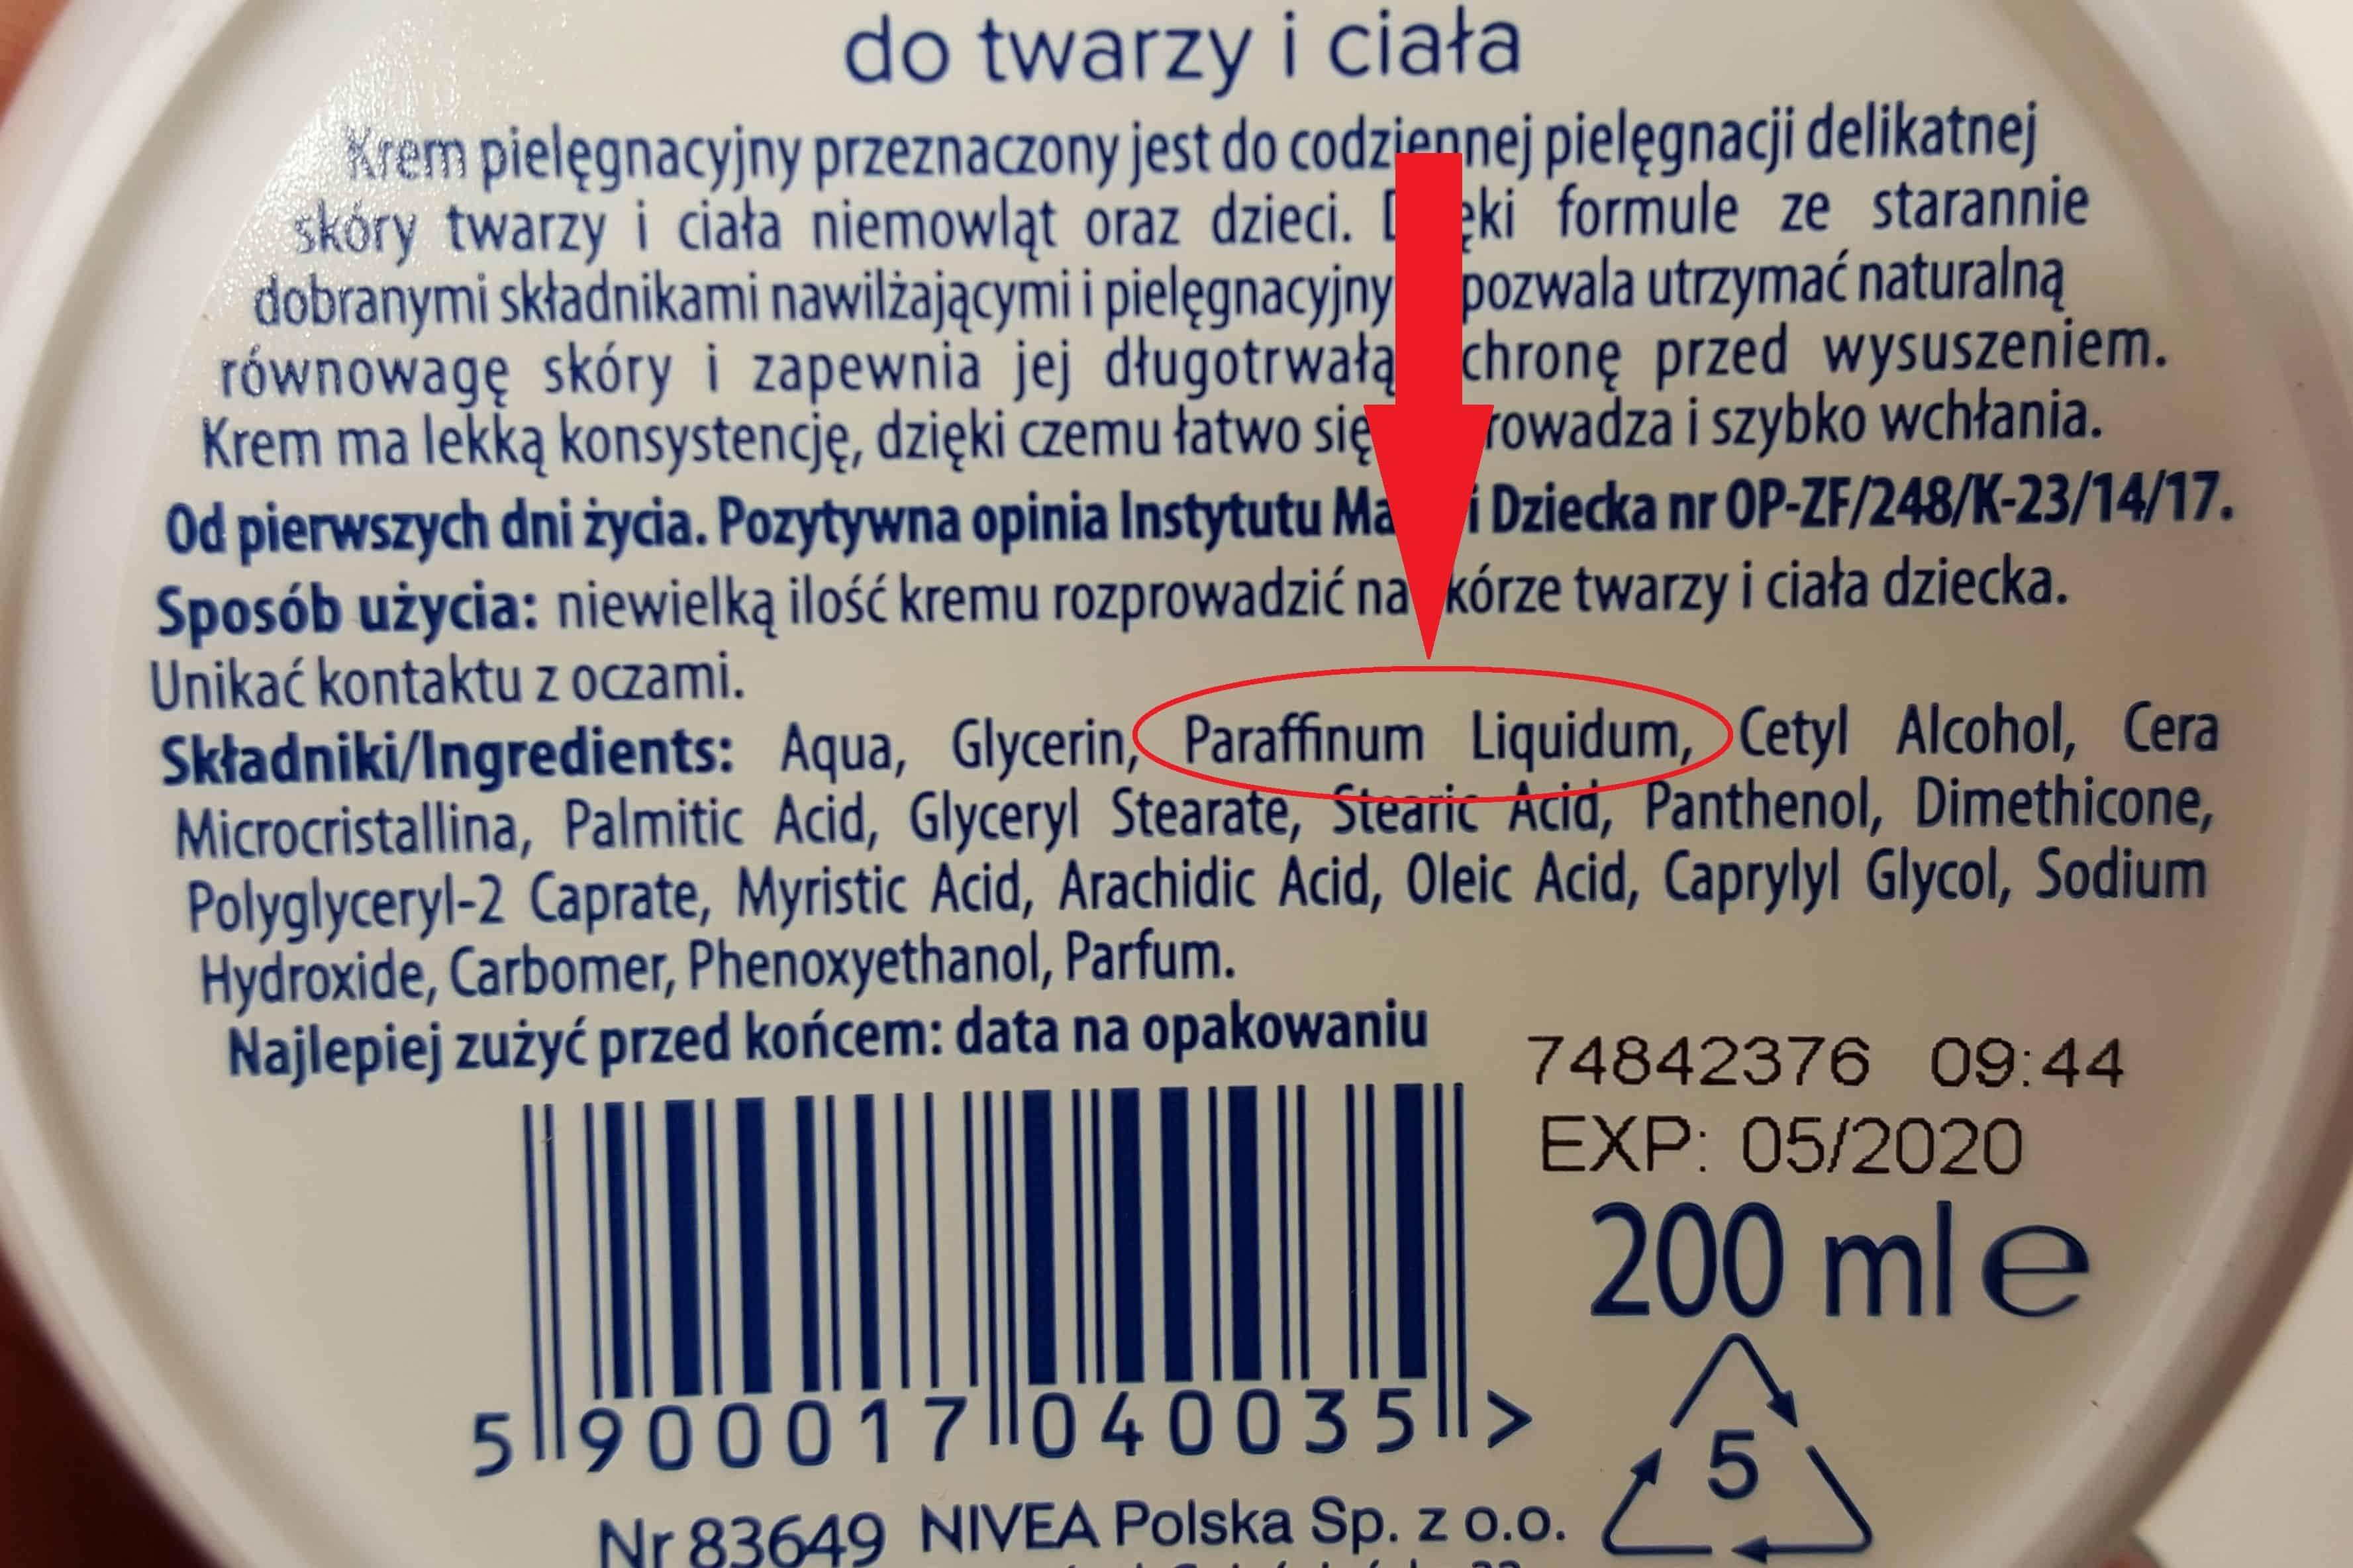 9. substancja ropopochodna Paraffinum Liquidum Parafina ciekła wkosmetykach dla dzieci iniemowląt Matka Aptekarka